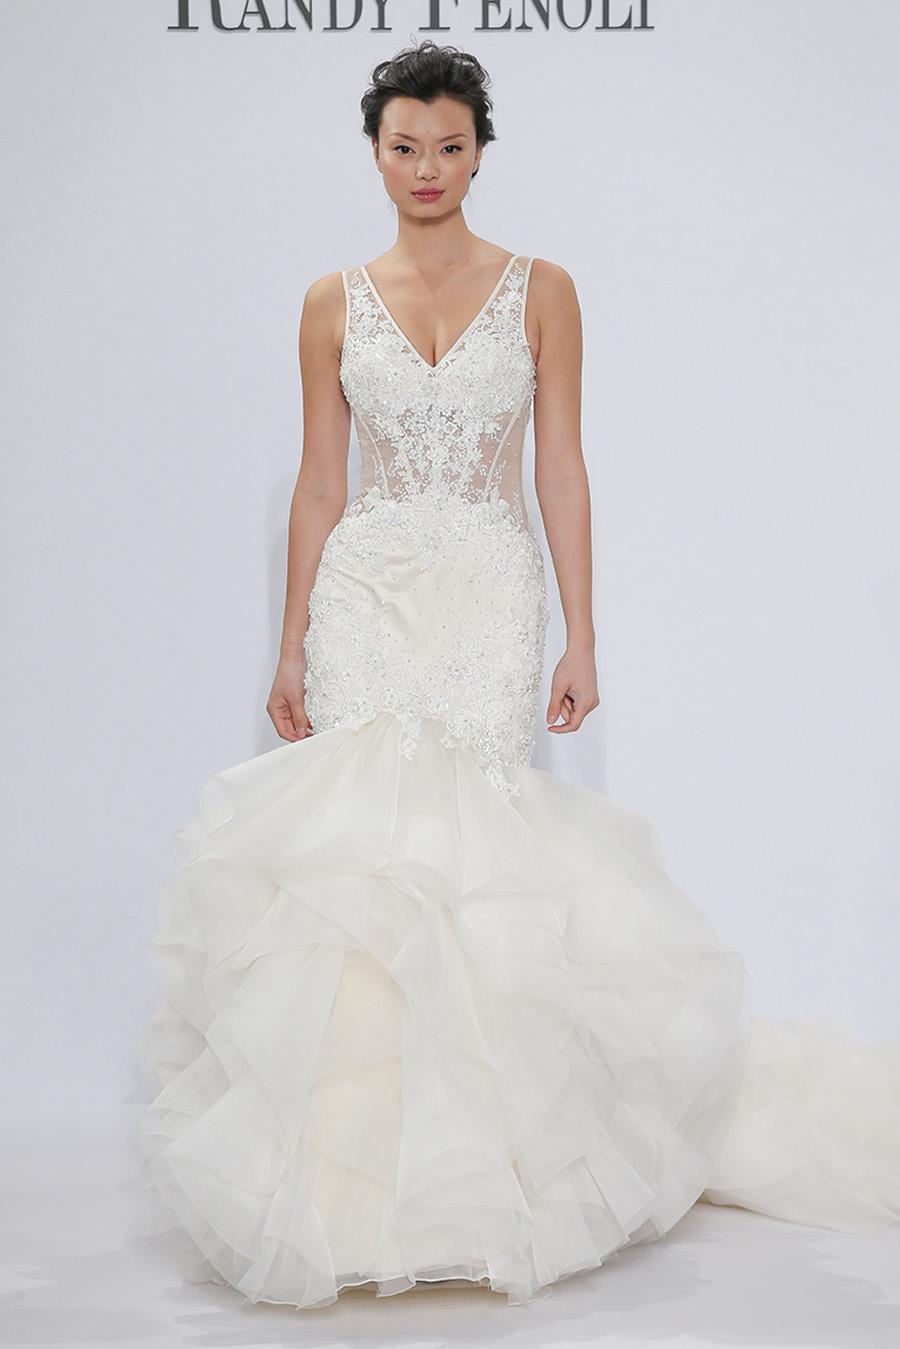 Randy Fenoli Bridal Collection gown 19